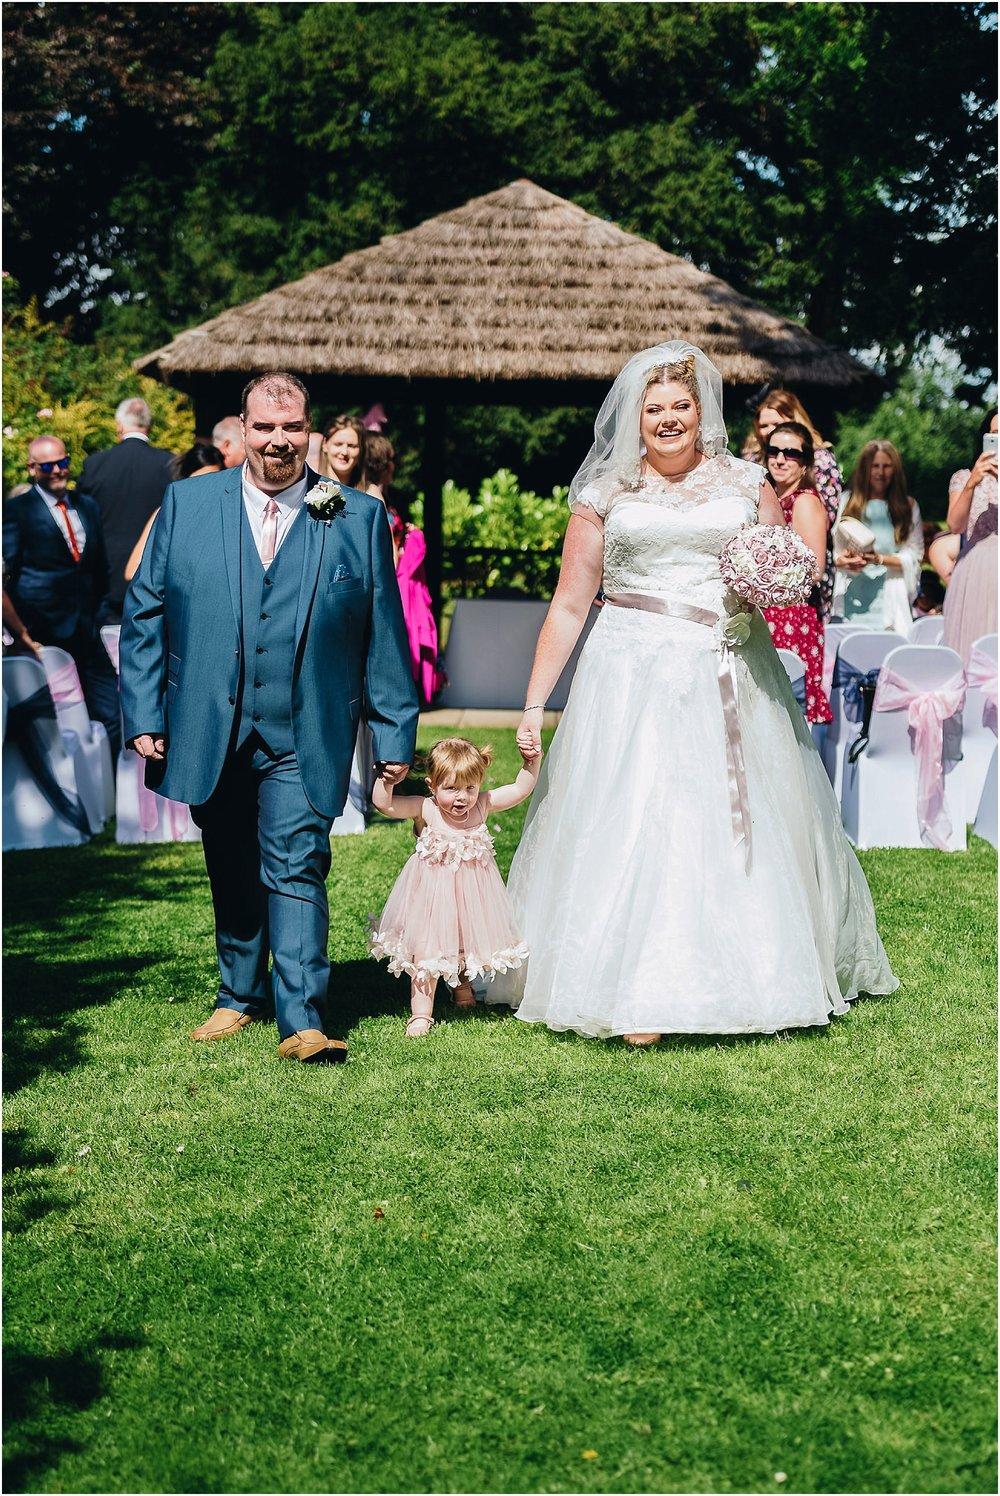 Staffordshire_wedding_photographer-59.jpg